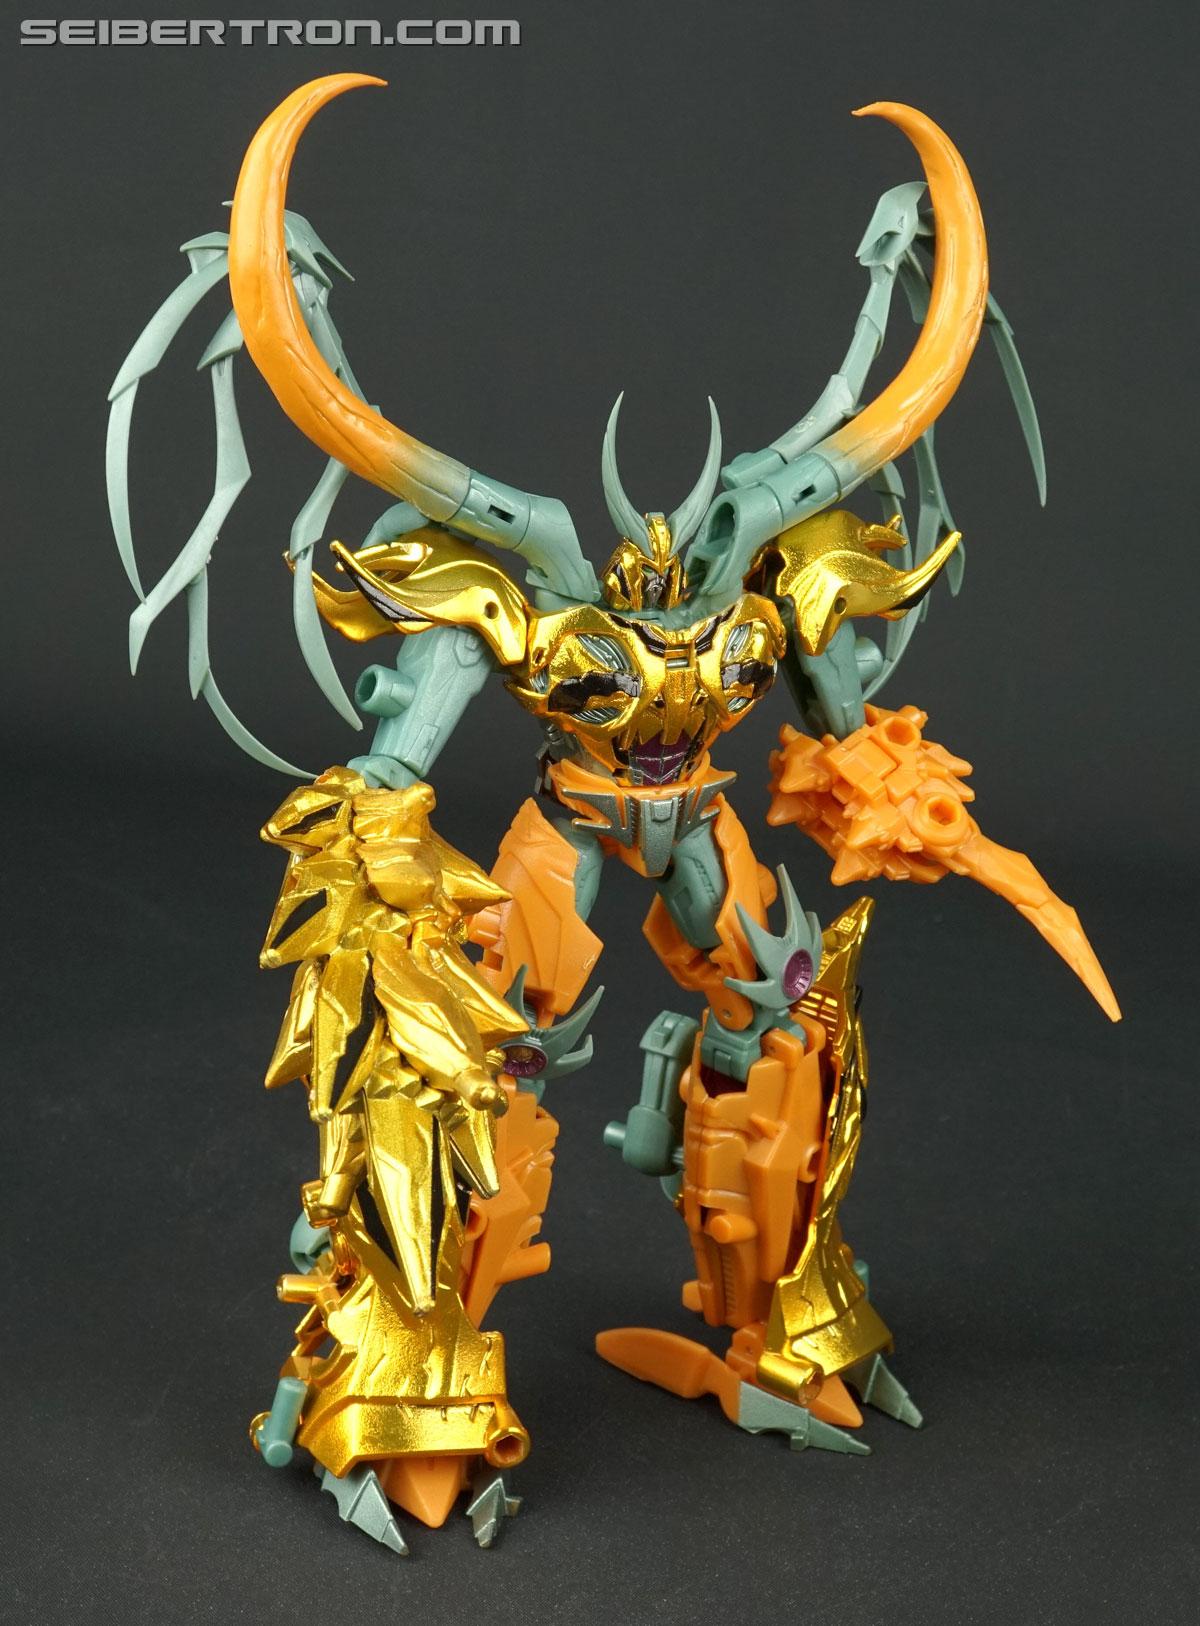 Transformers Arms Micron Gaia Unicron (Image #151 of 201)